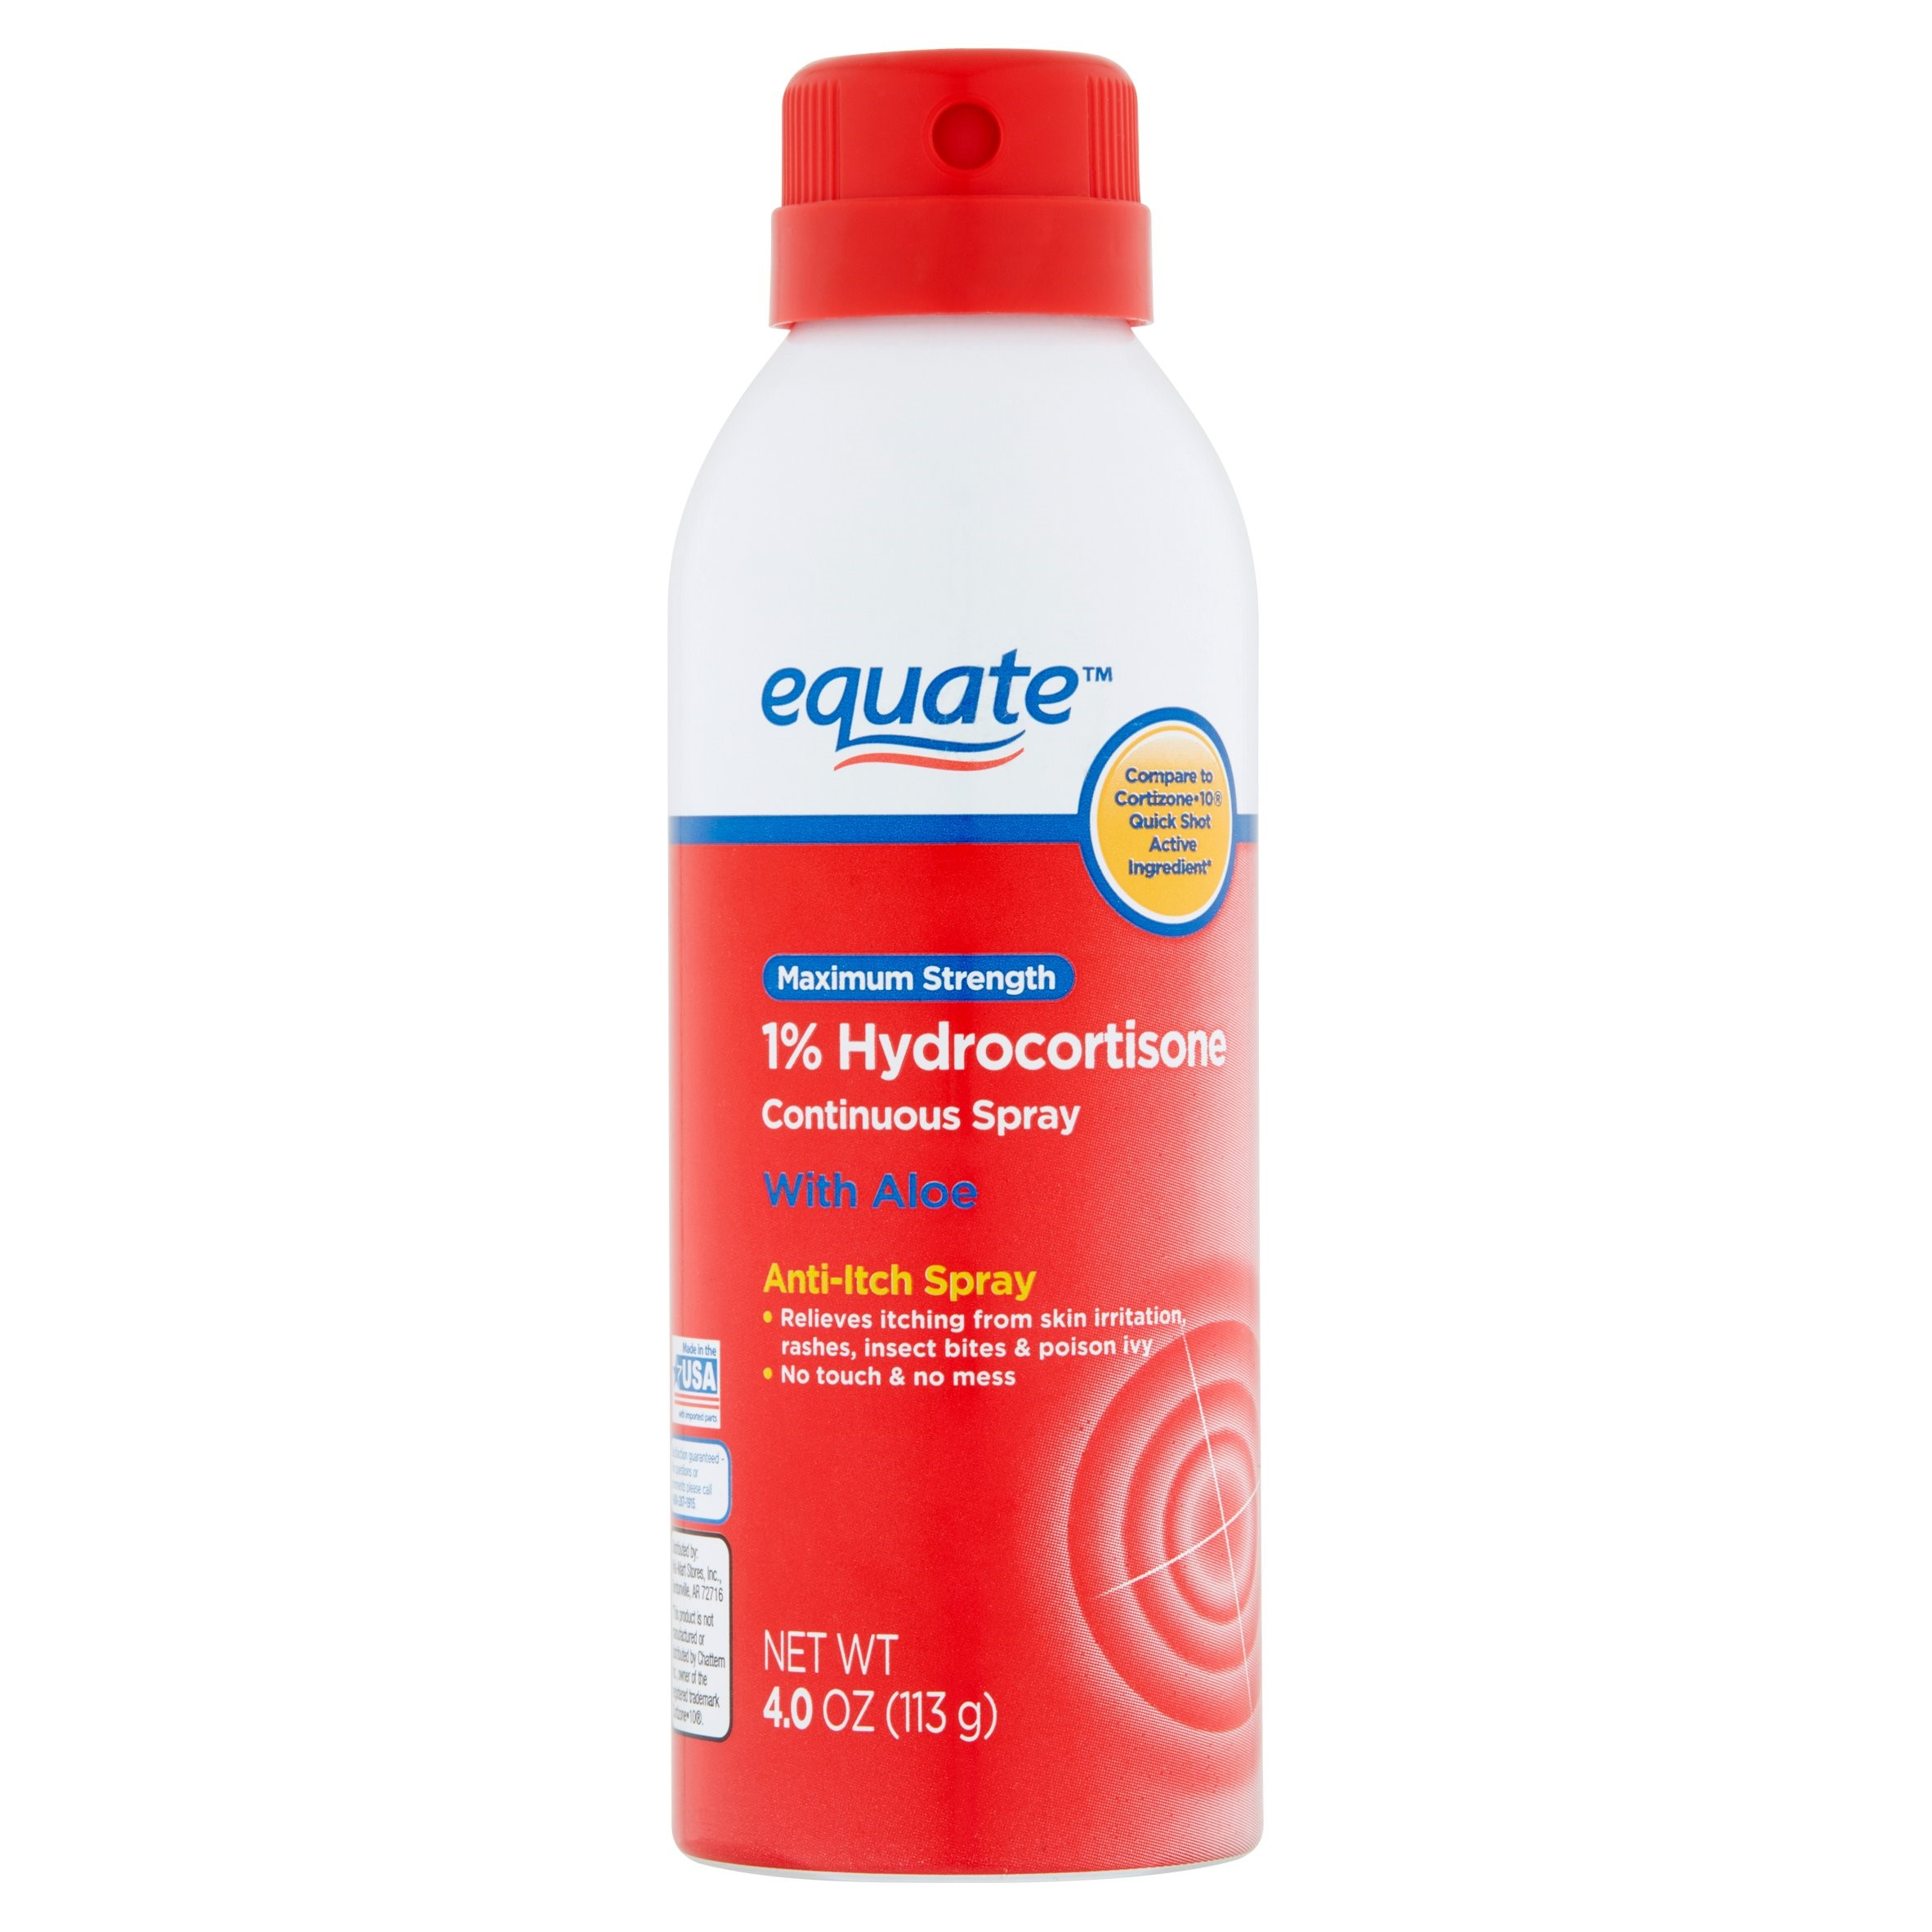 Equate Maximum Strength Anti Itch Hydrocortisone Spray, 4 Oz